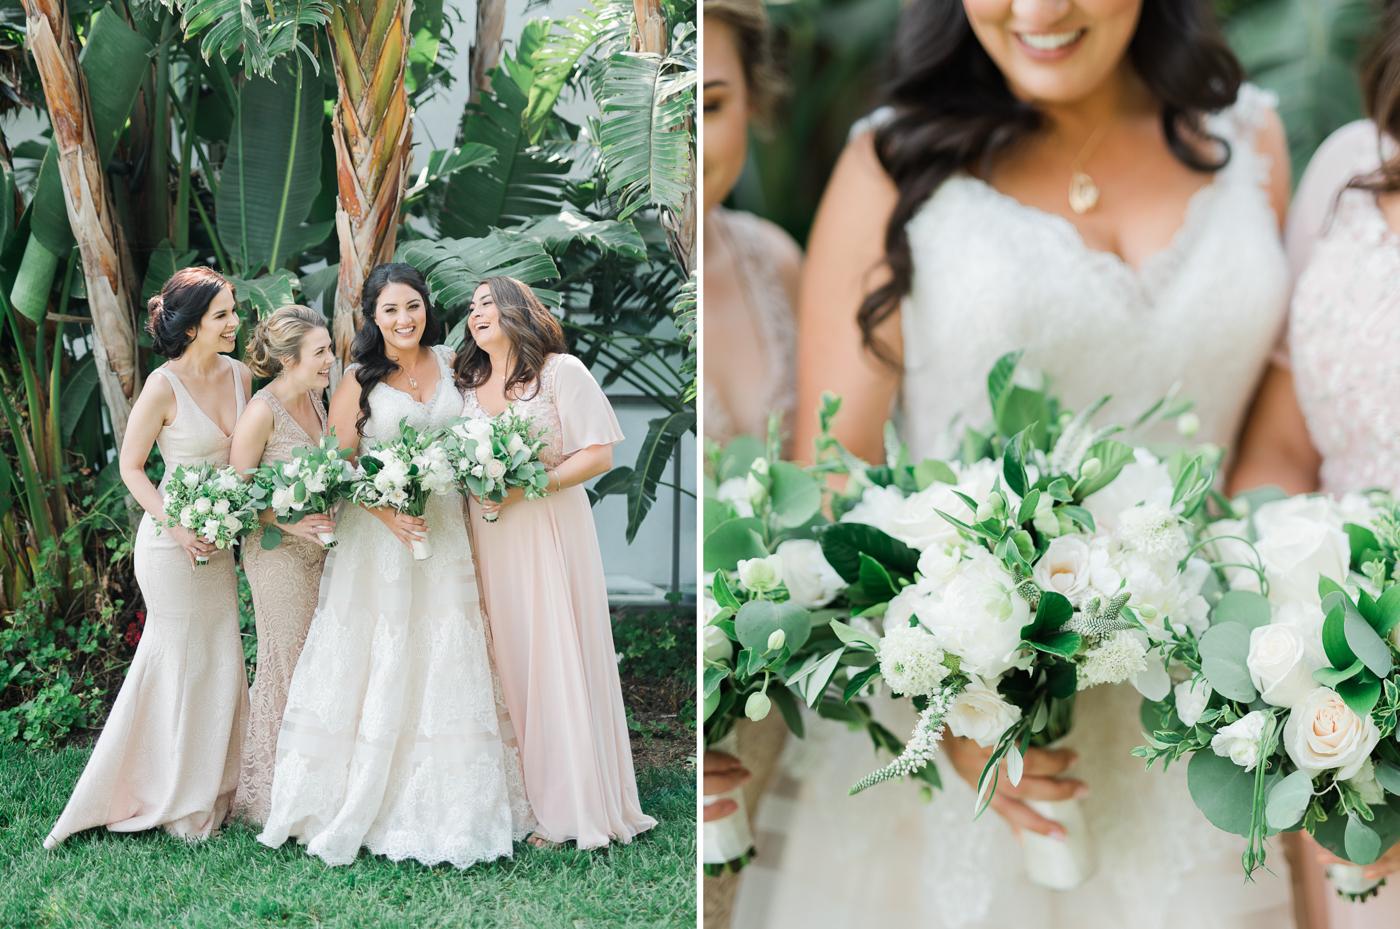 AKP_S&F_Malibu_Wedding_Fine_Art_Photography_Los_Angeles-7_bridesmaids_flowers.jpg